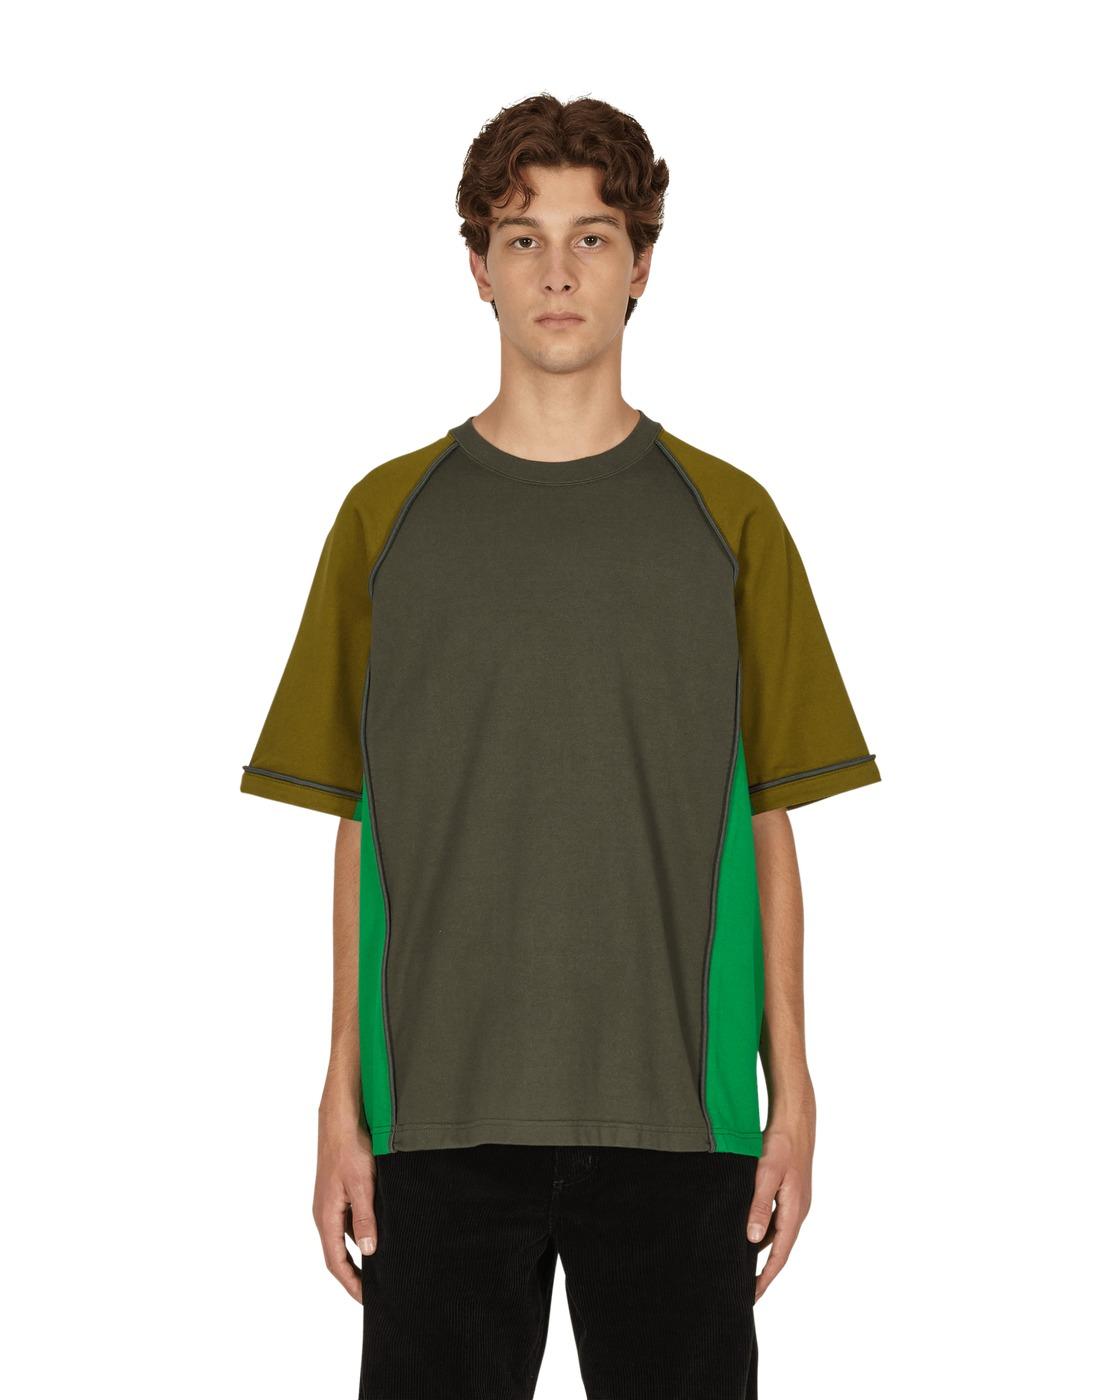 Photo: Cav Empt Paneled Heavy Big T Shirt Green